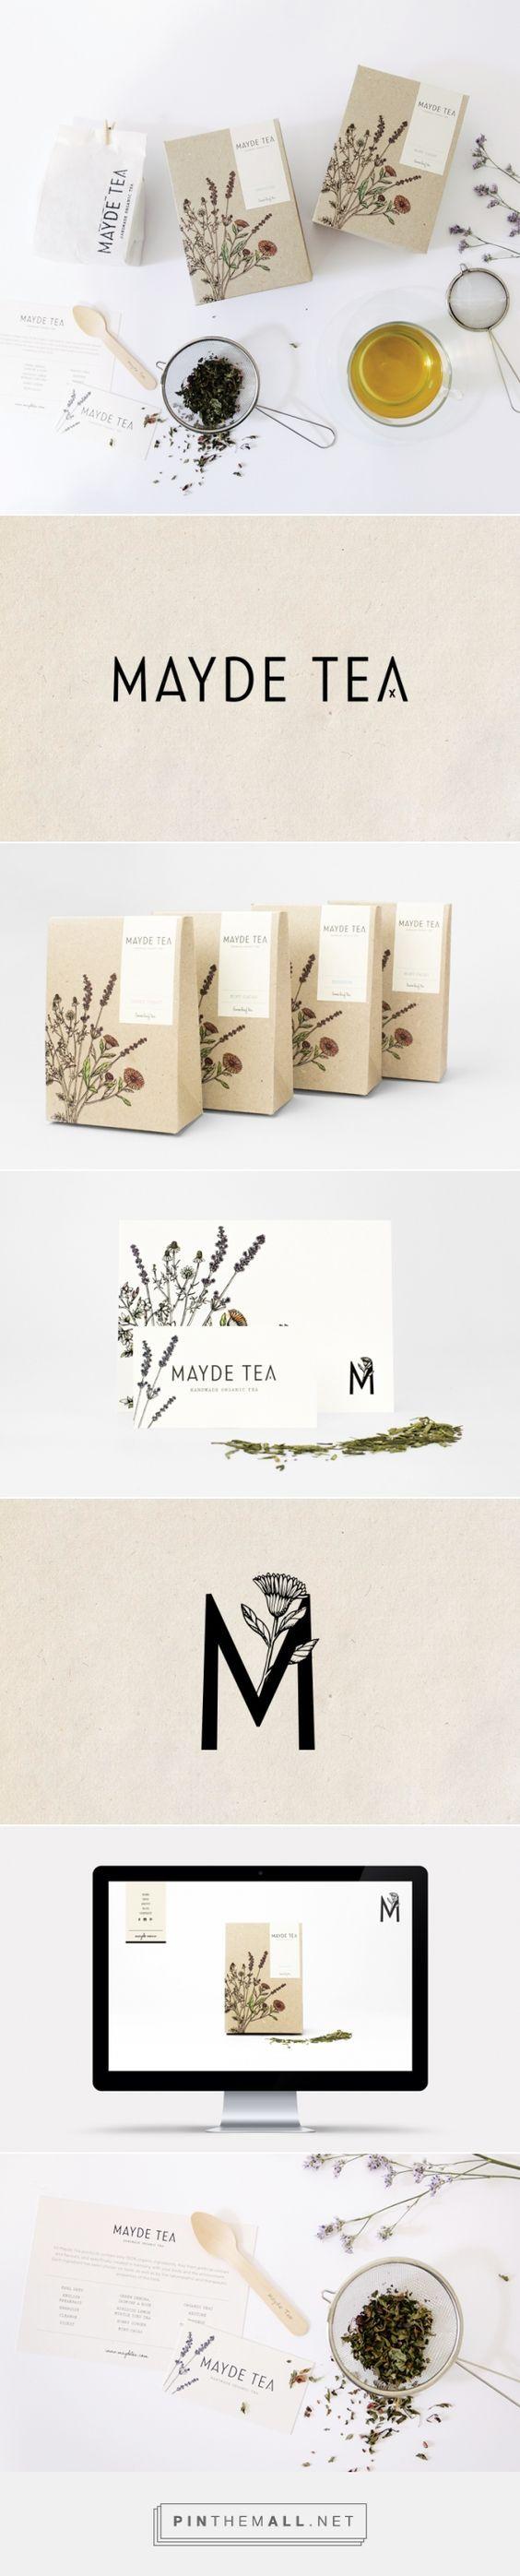 MAYDE Tea Branding and Packaging by Smack Bang Designs | Fivestar Branding –…